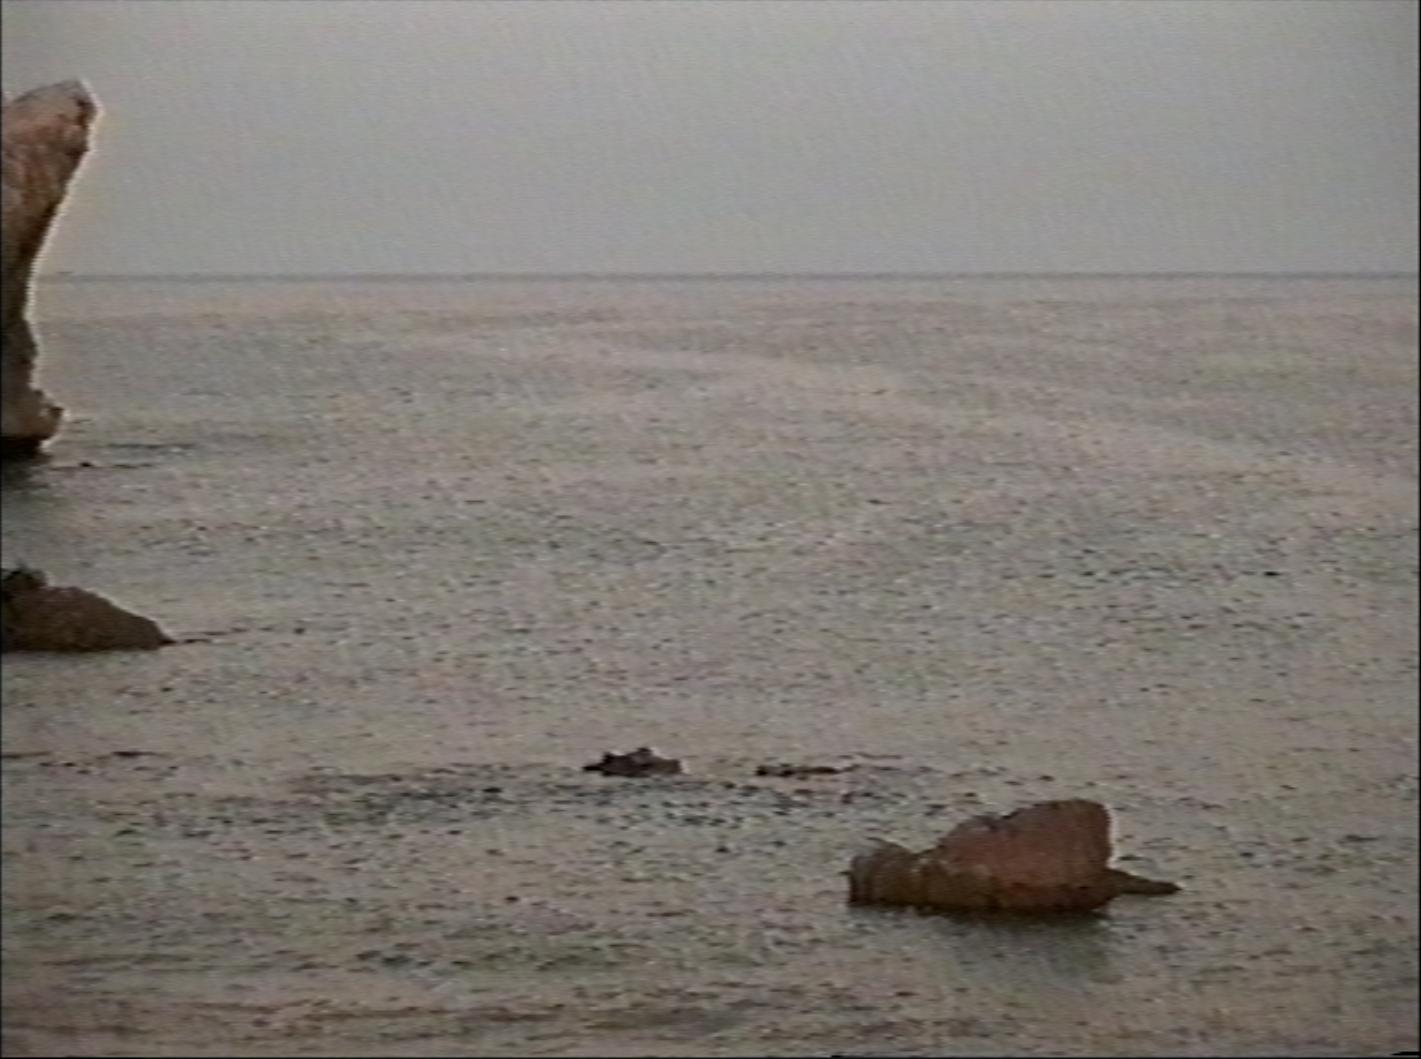 Lala Rukh  gadani. 2001.07.00 - 19.00 2001 Video 01.17.56 hrs. Edition of 3